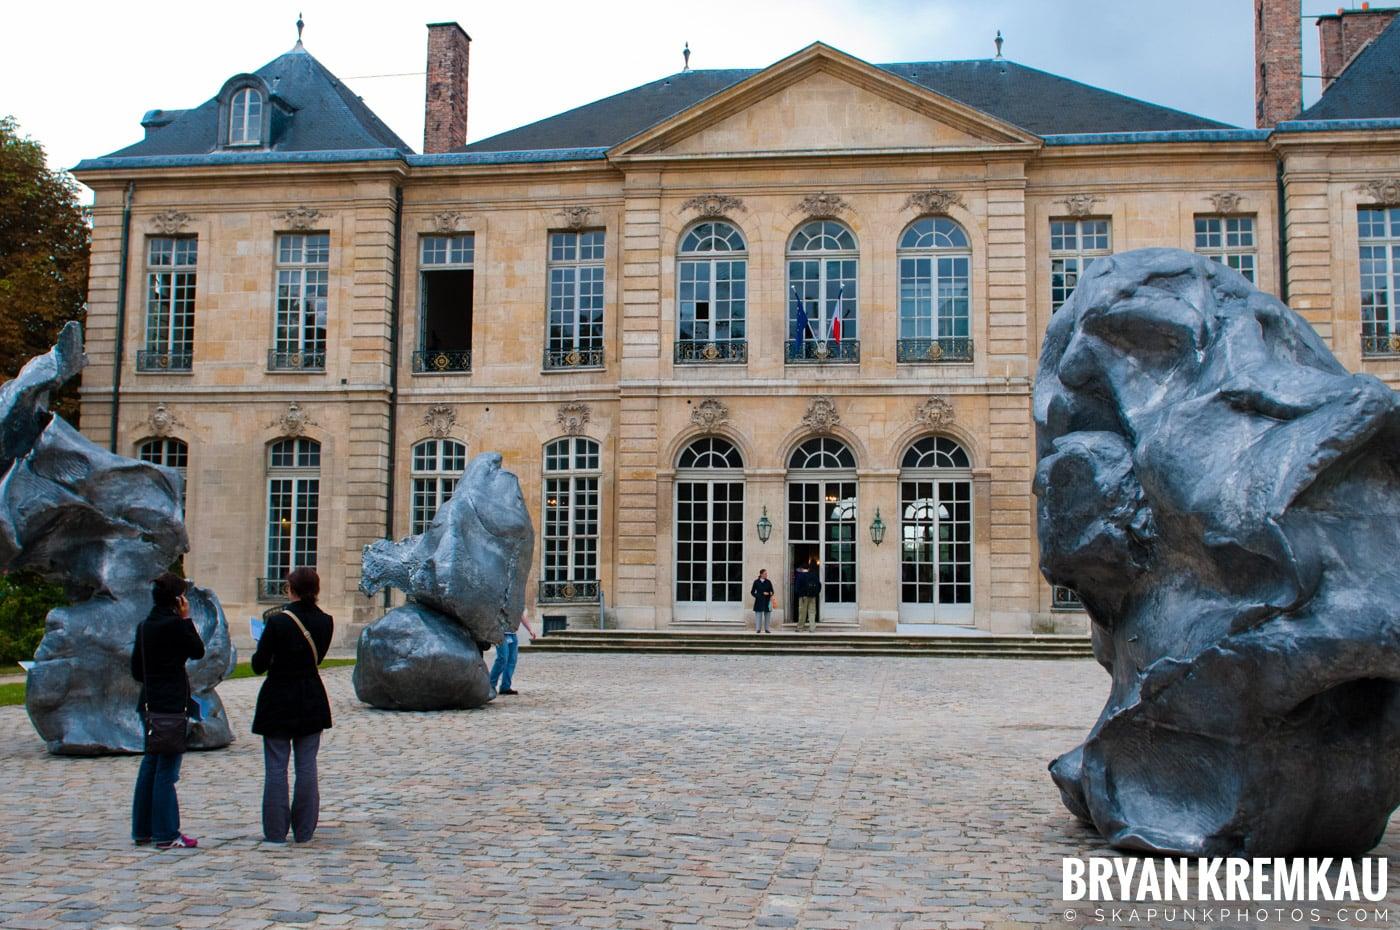 Paris, France Honeymoon - Day 4 - 7.21.11 (59)